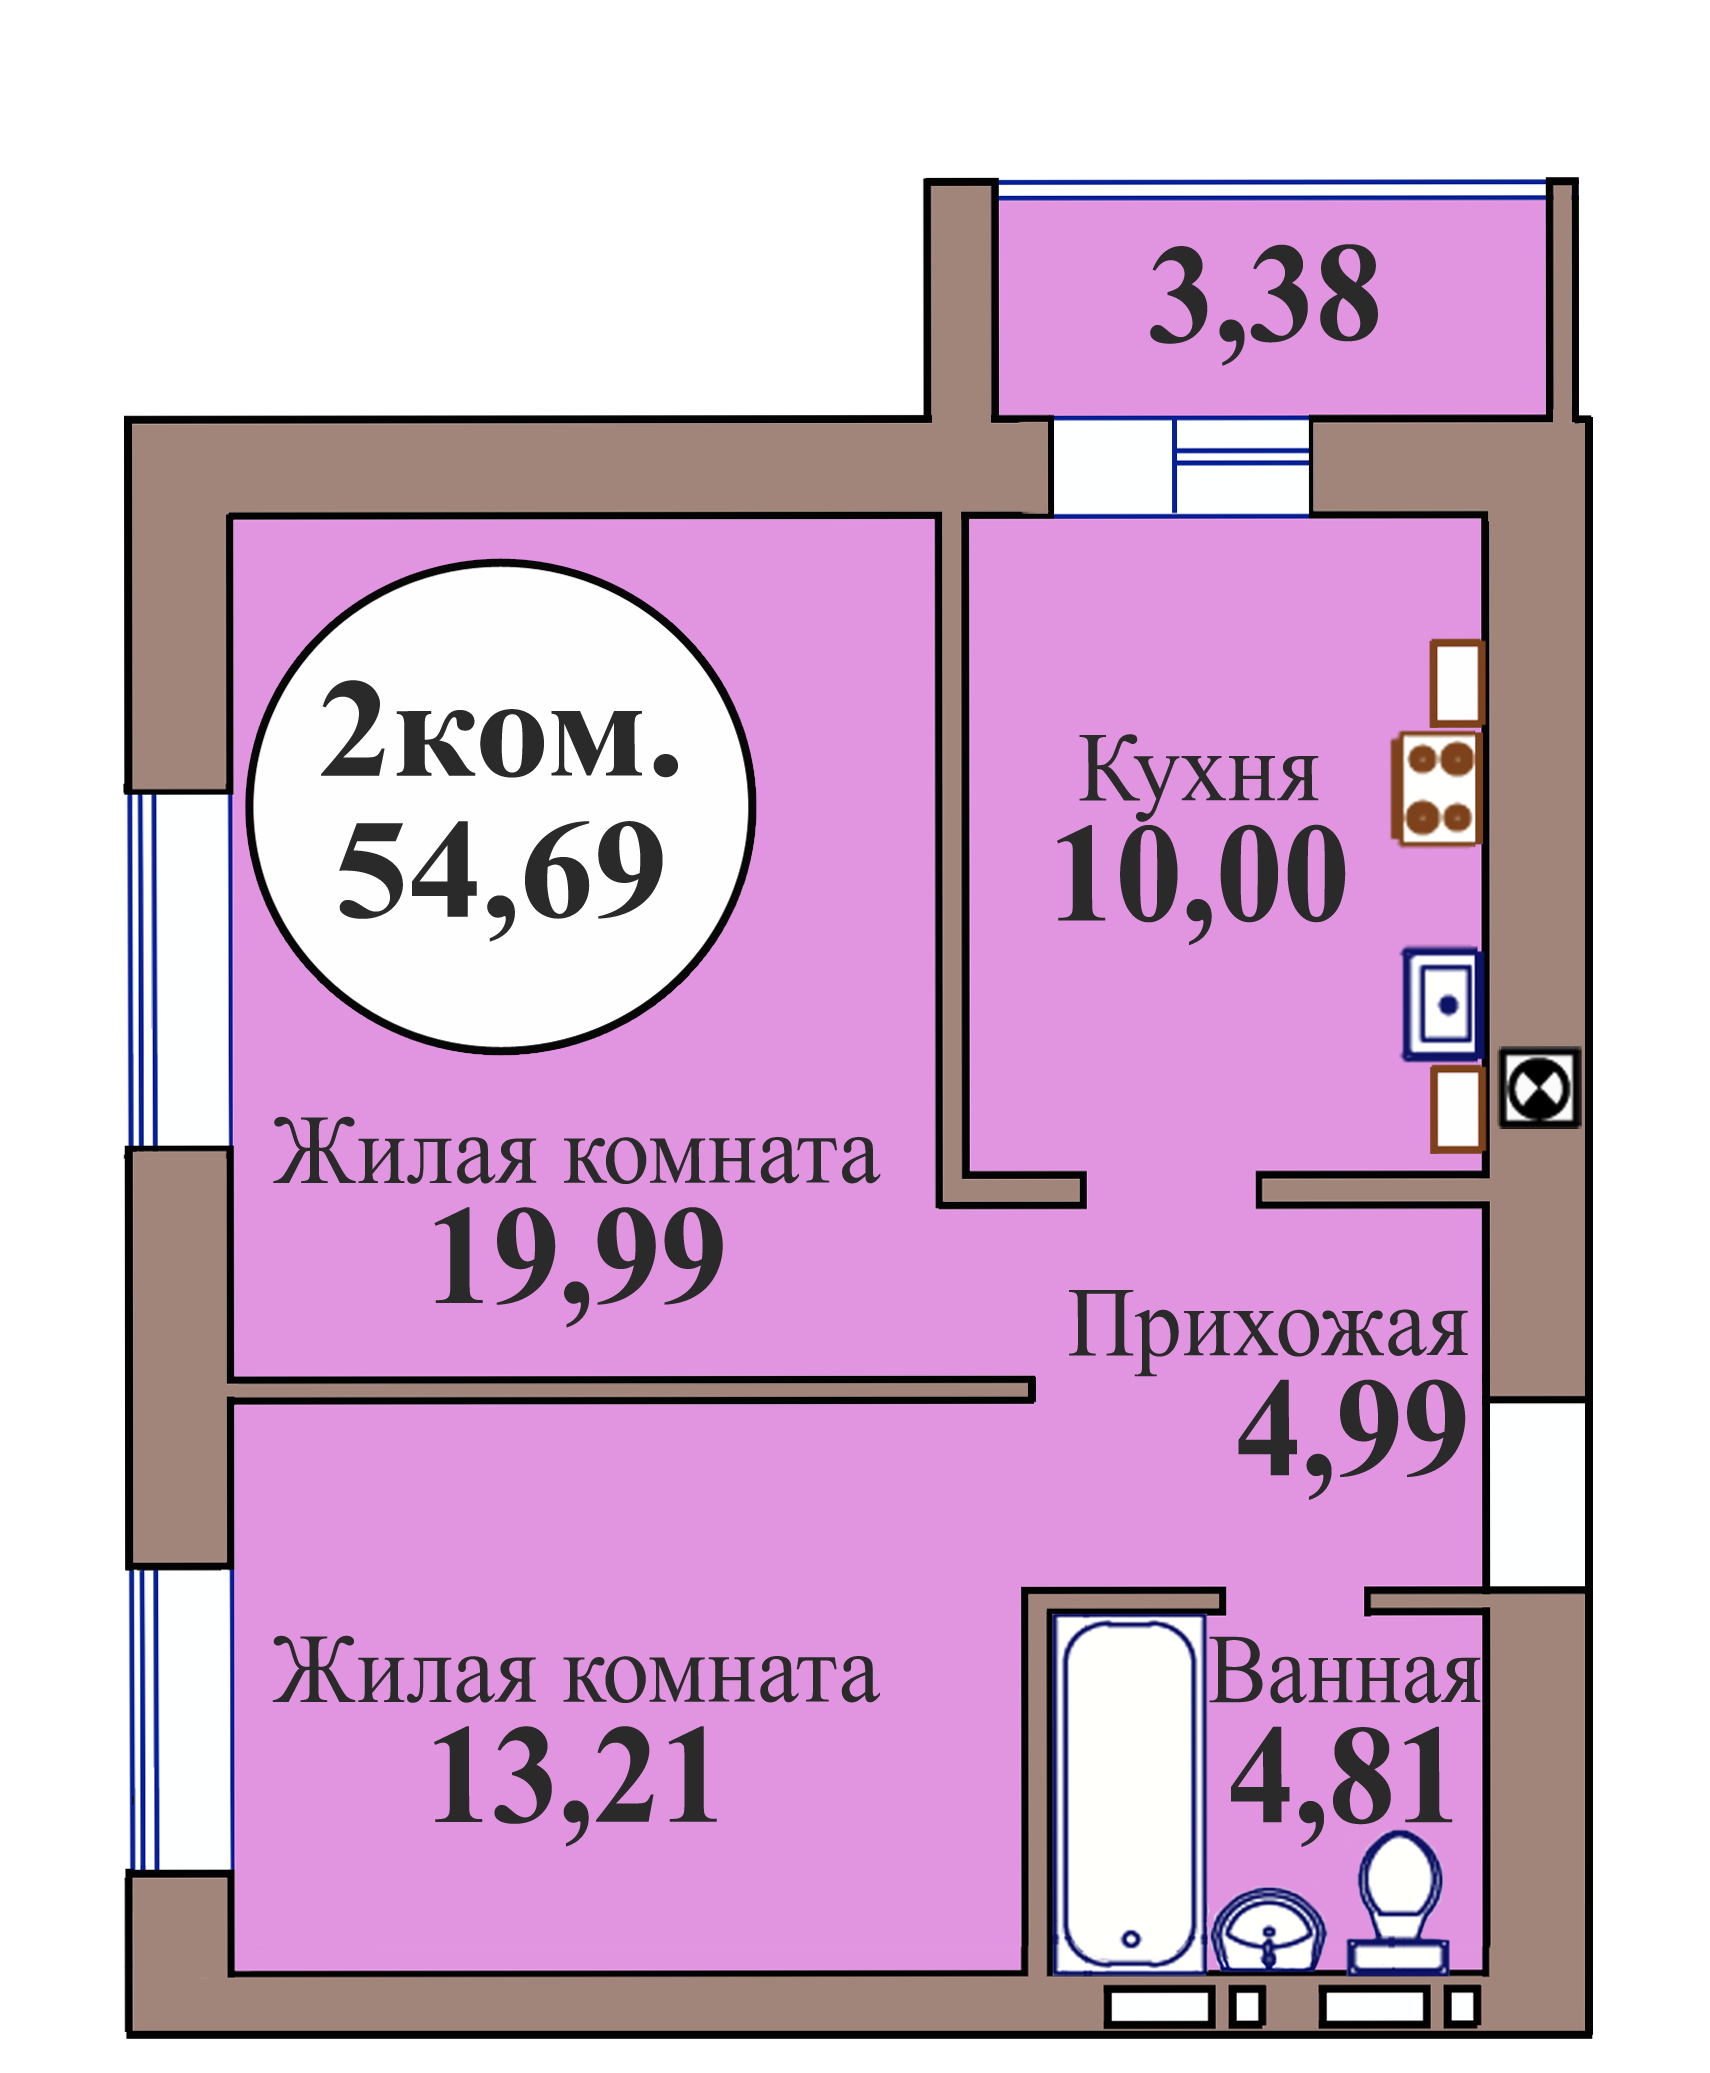 2-комн. кв. по пер. Калининградский, 5 кв. 227 в Калининграде